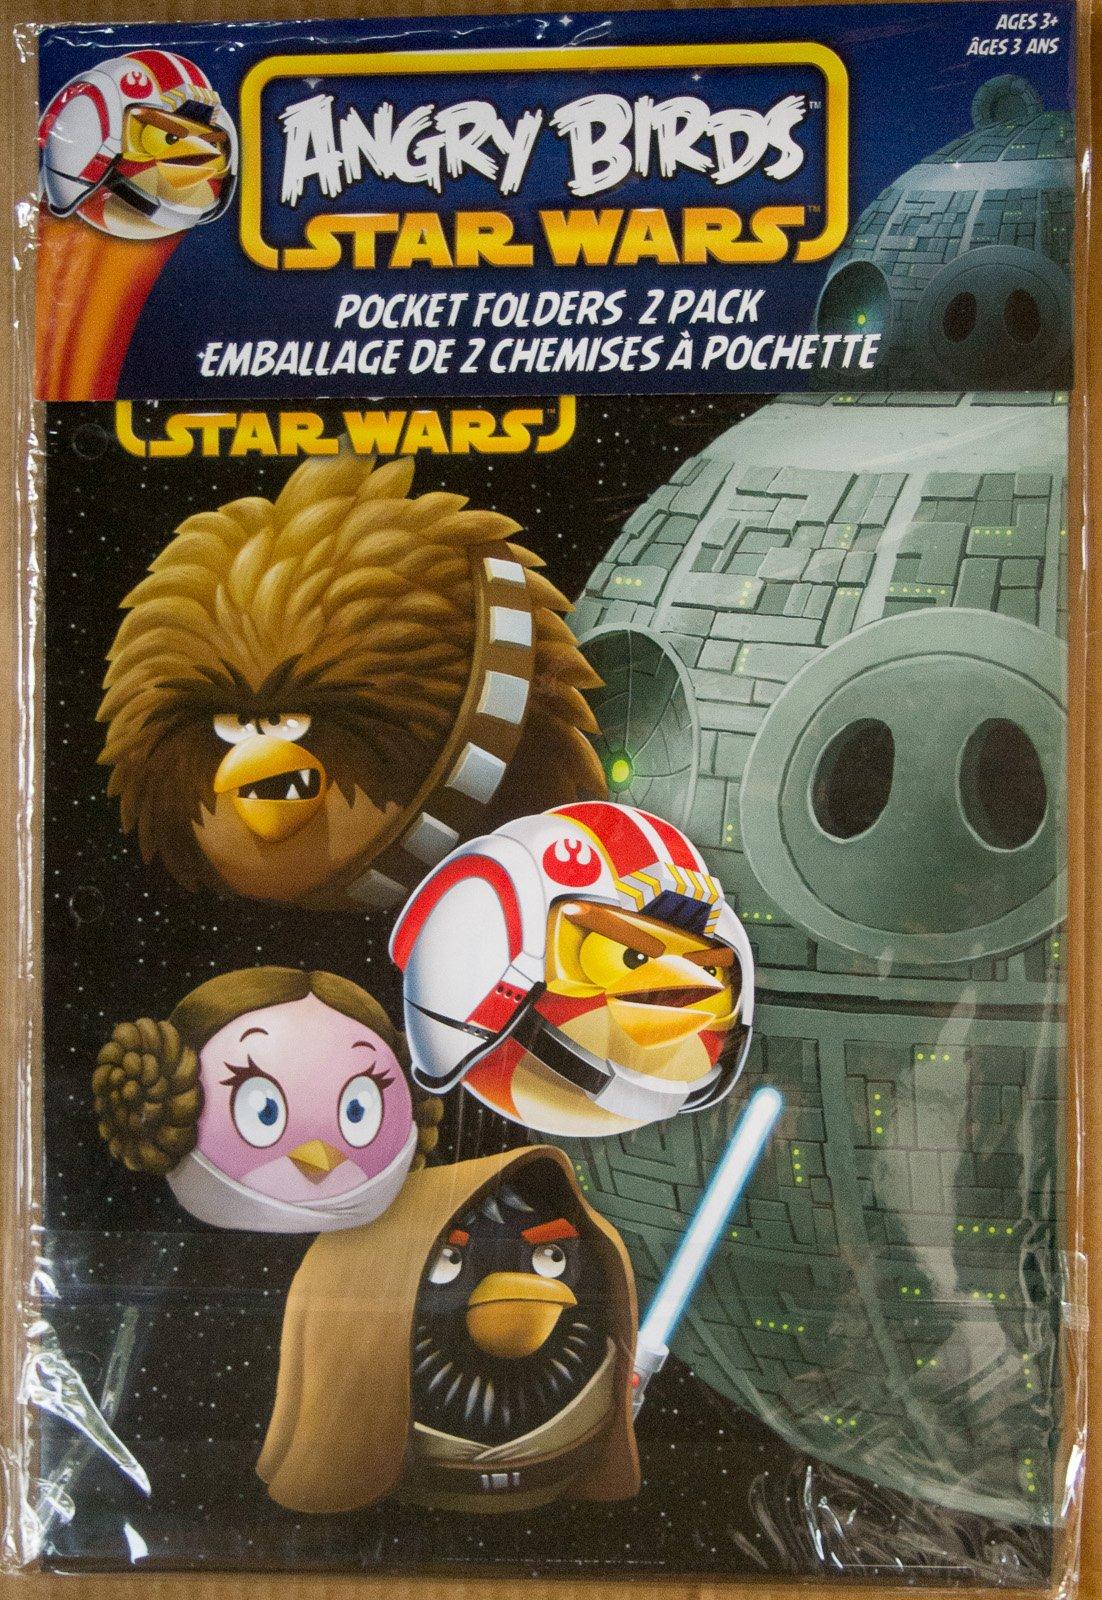 Angry Birds Star Wars Pocket Folders - 2 Pack